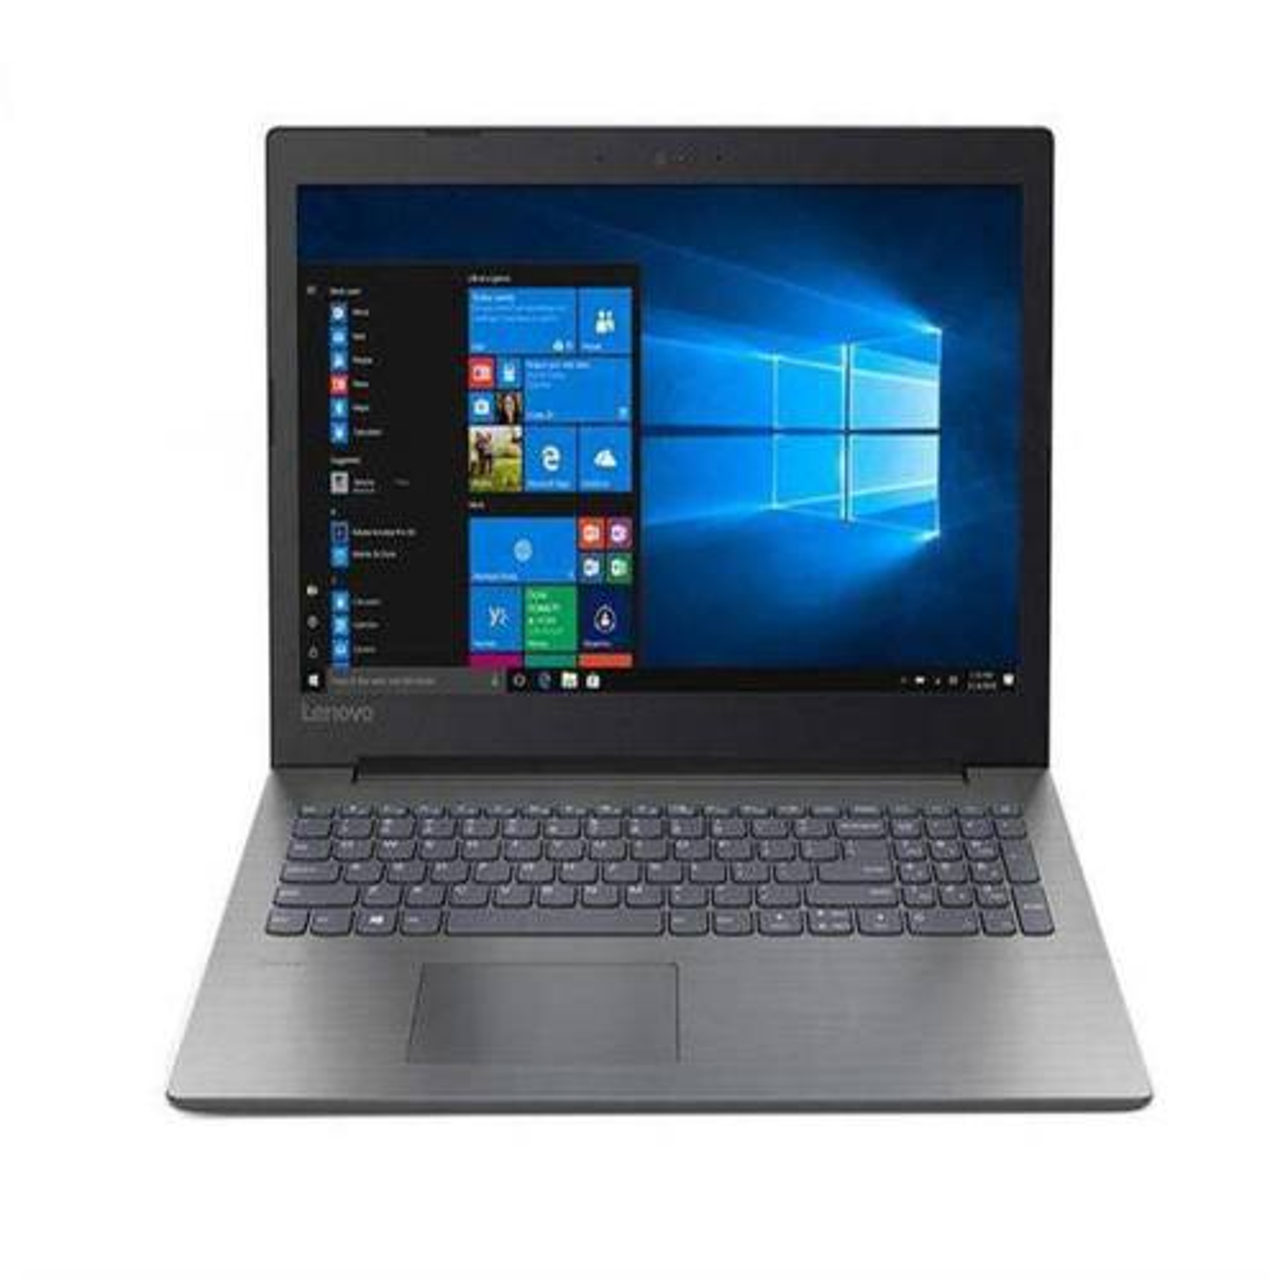 لپ تاپ 15 اینچی لنوو مدل Ideapad 330 - FC